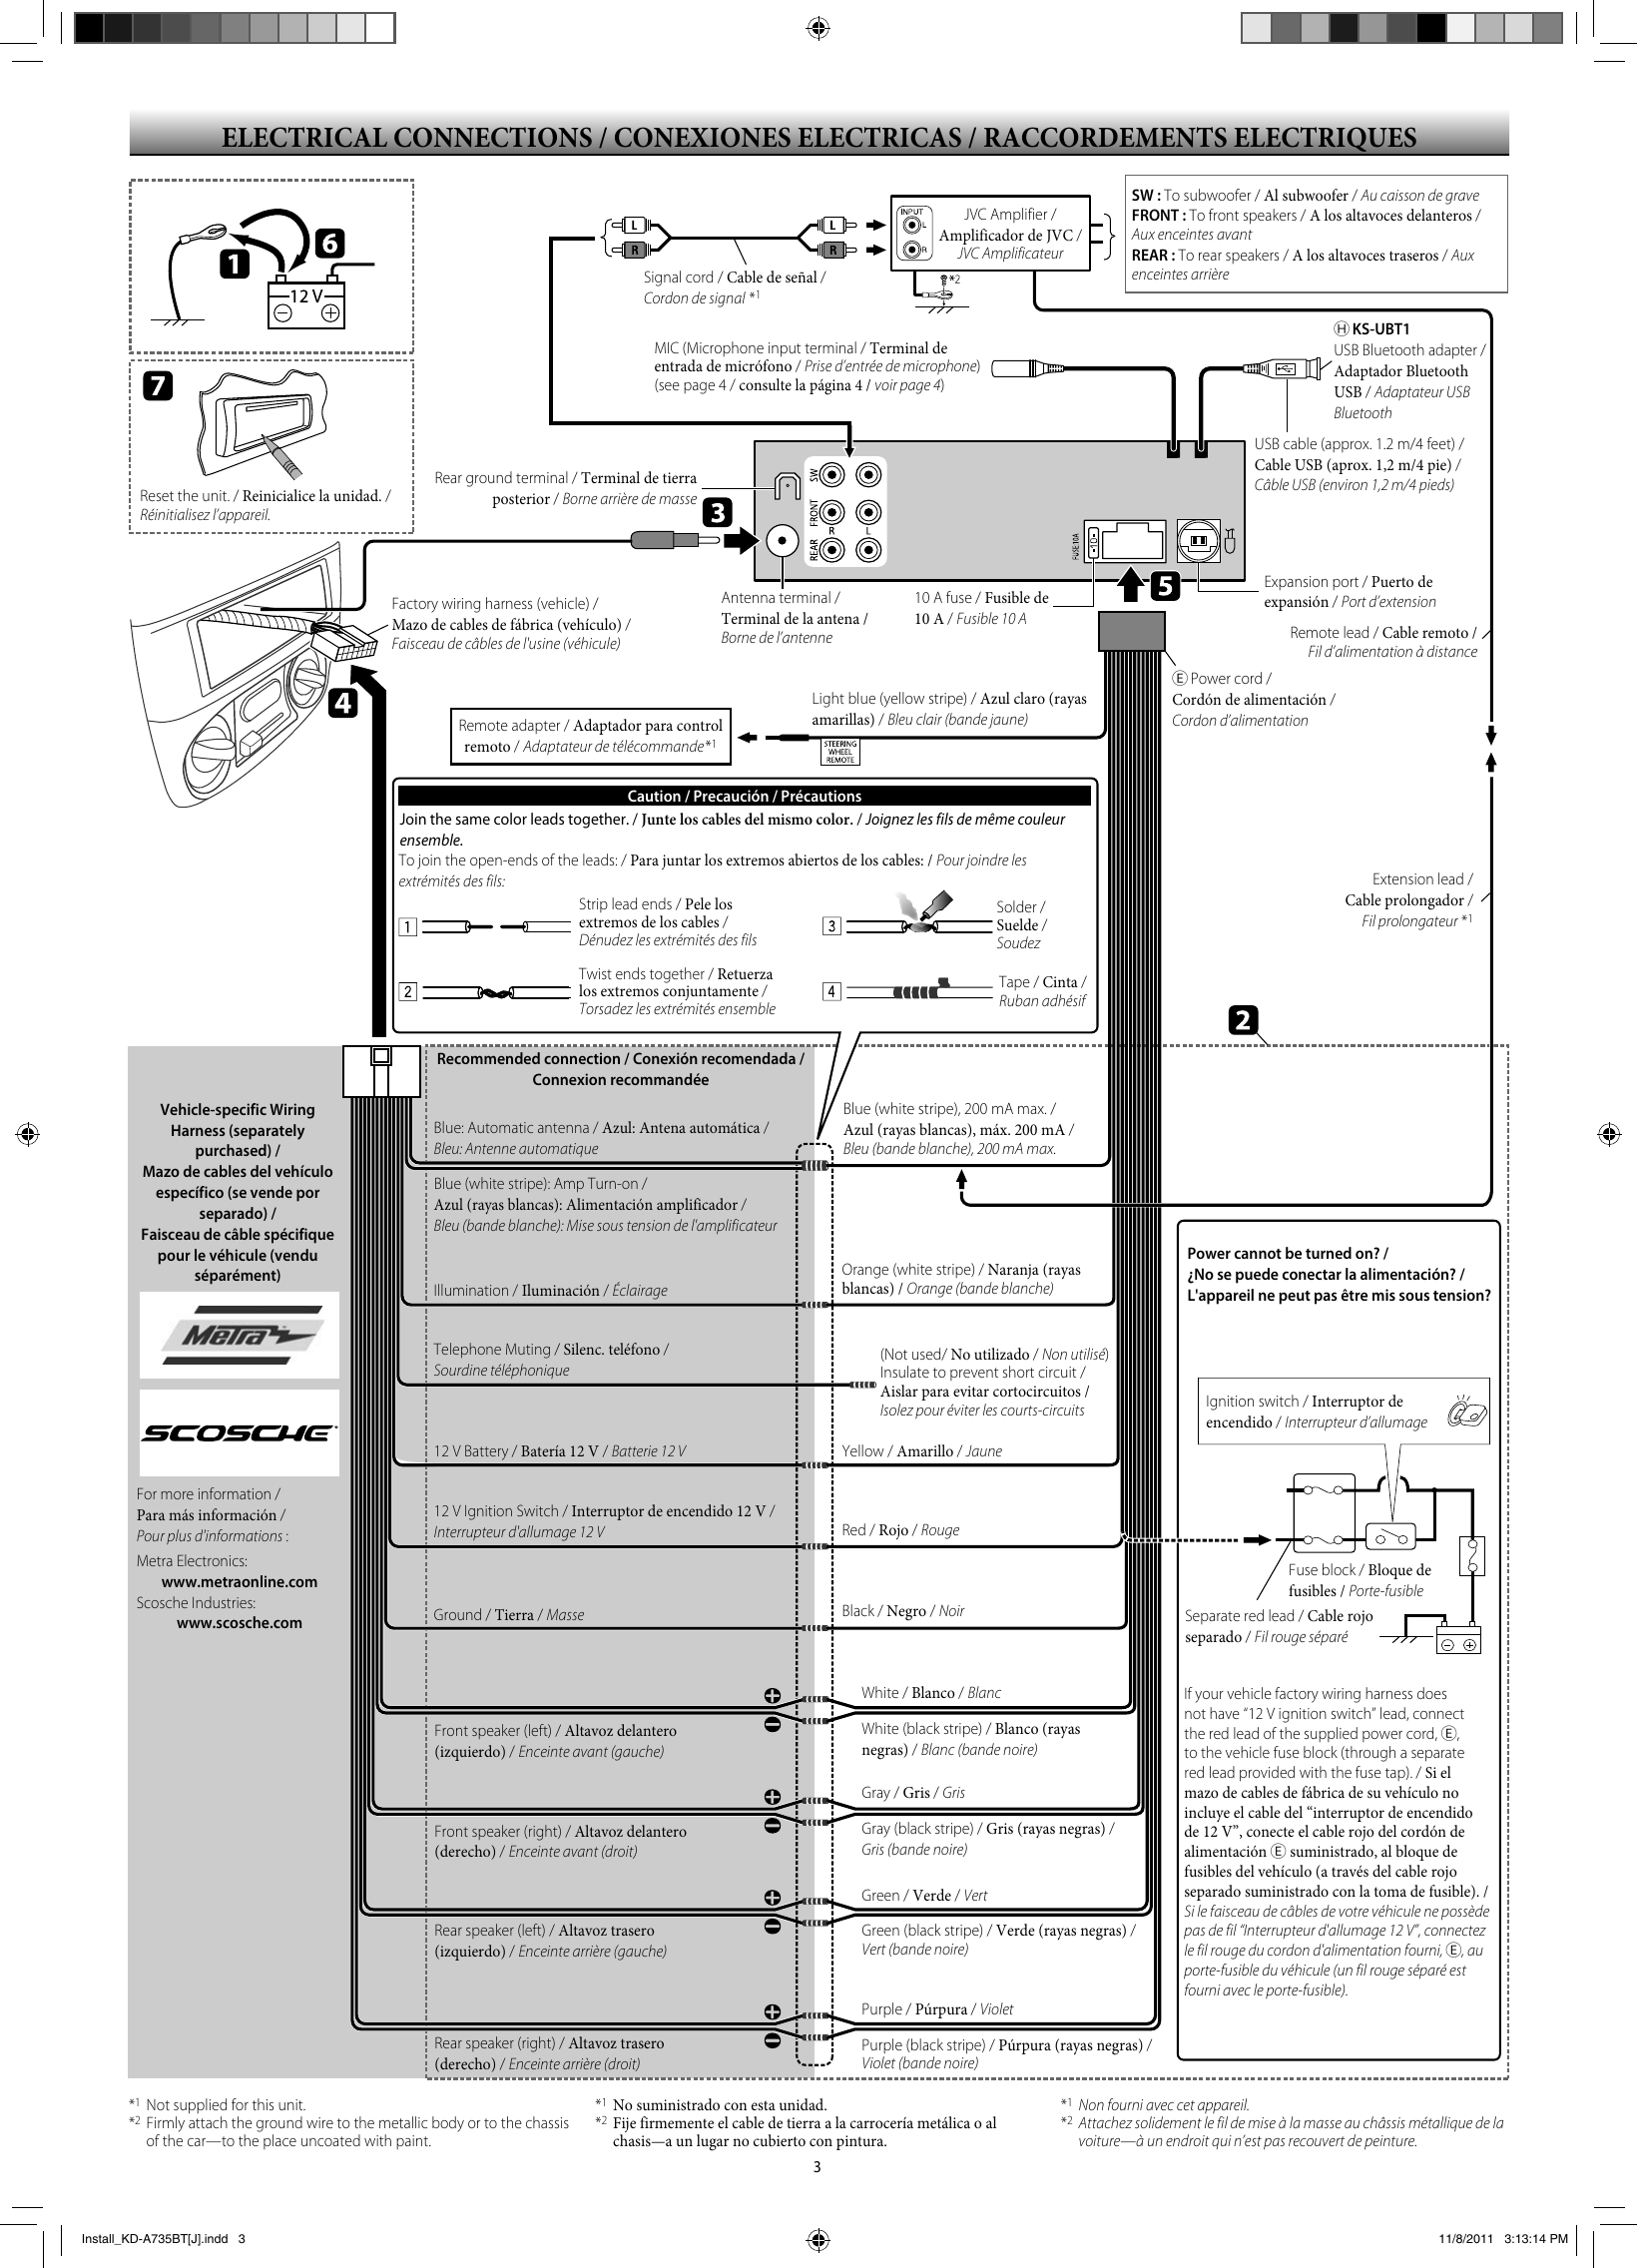 page 3 of 4 - jvc jvc-kd-r730bt-installation-manual-